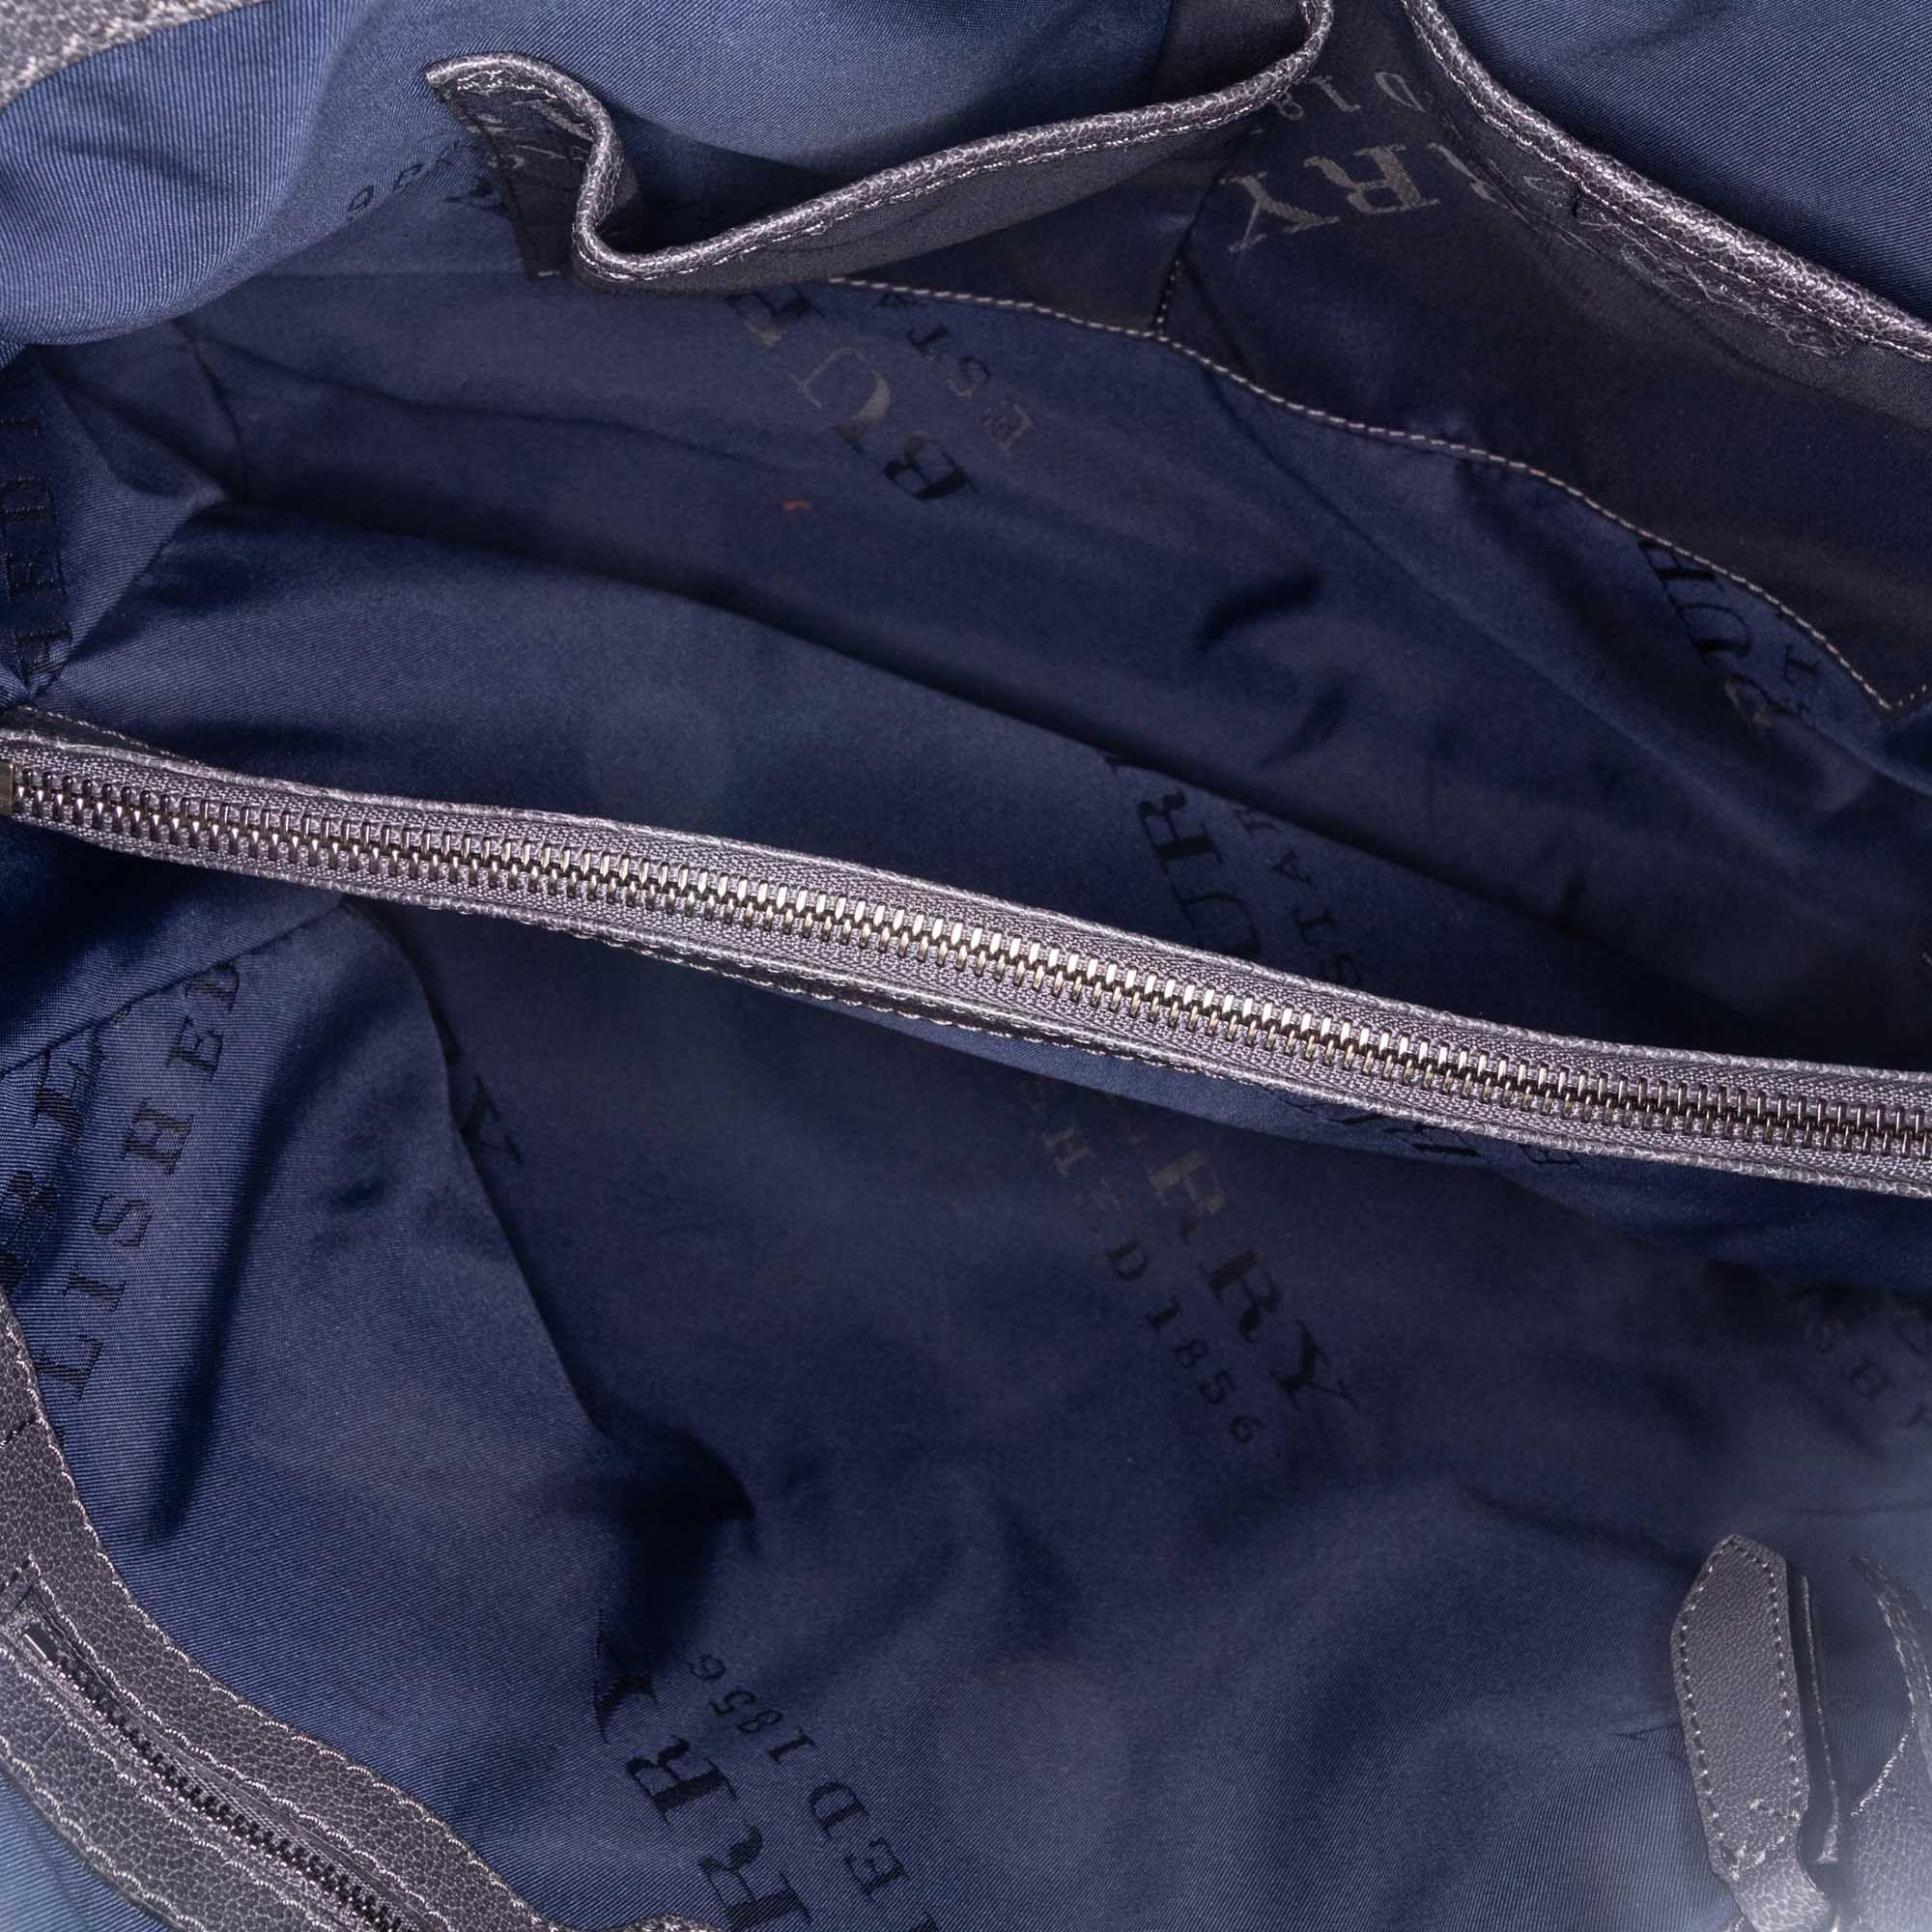 Vintage Burberry Raffia Tote Bag Gray